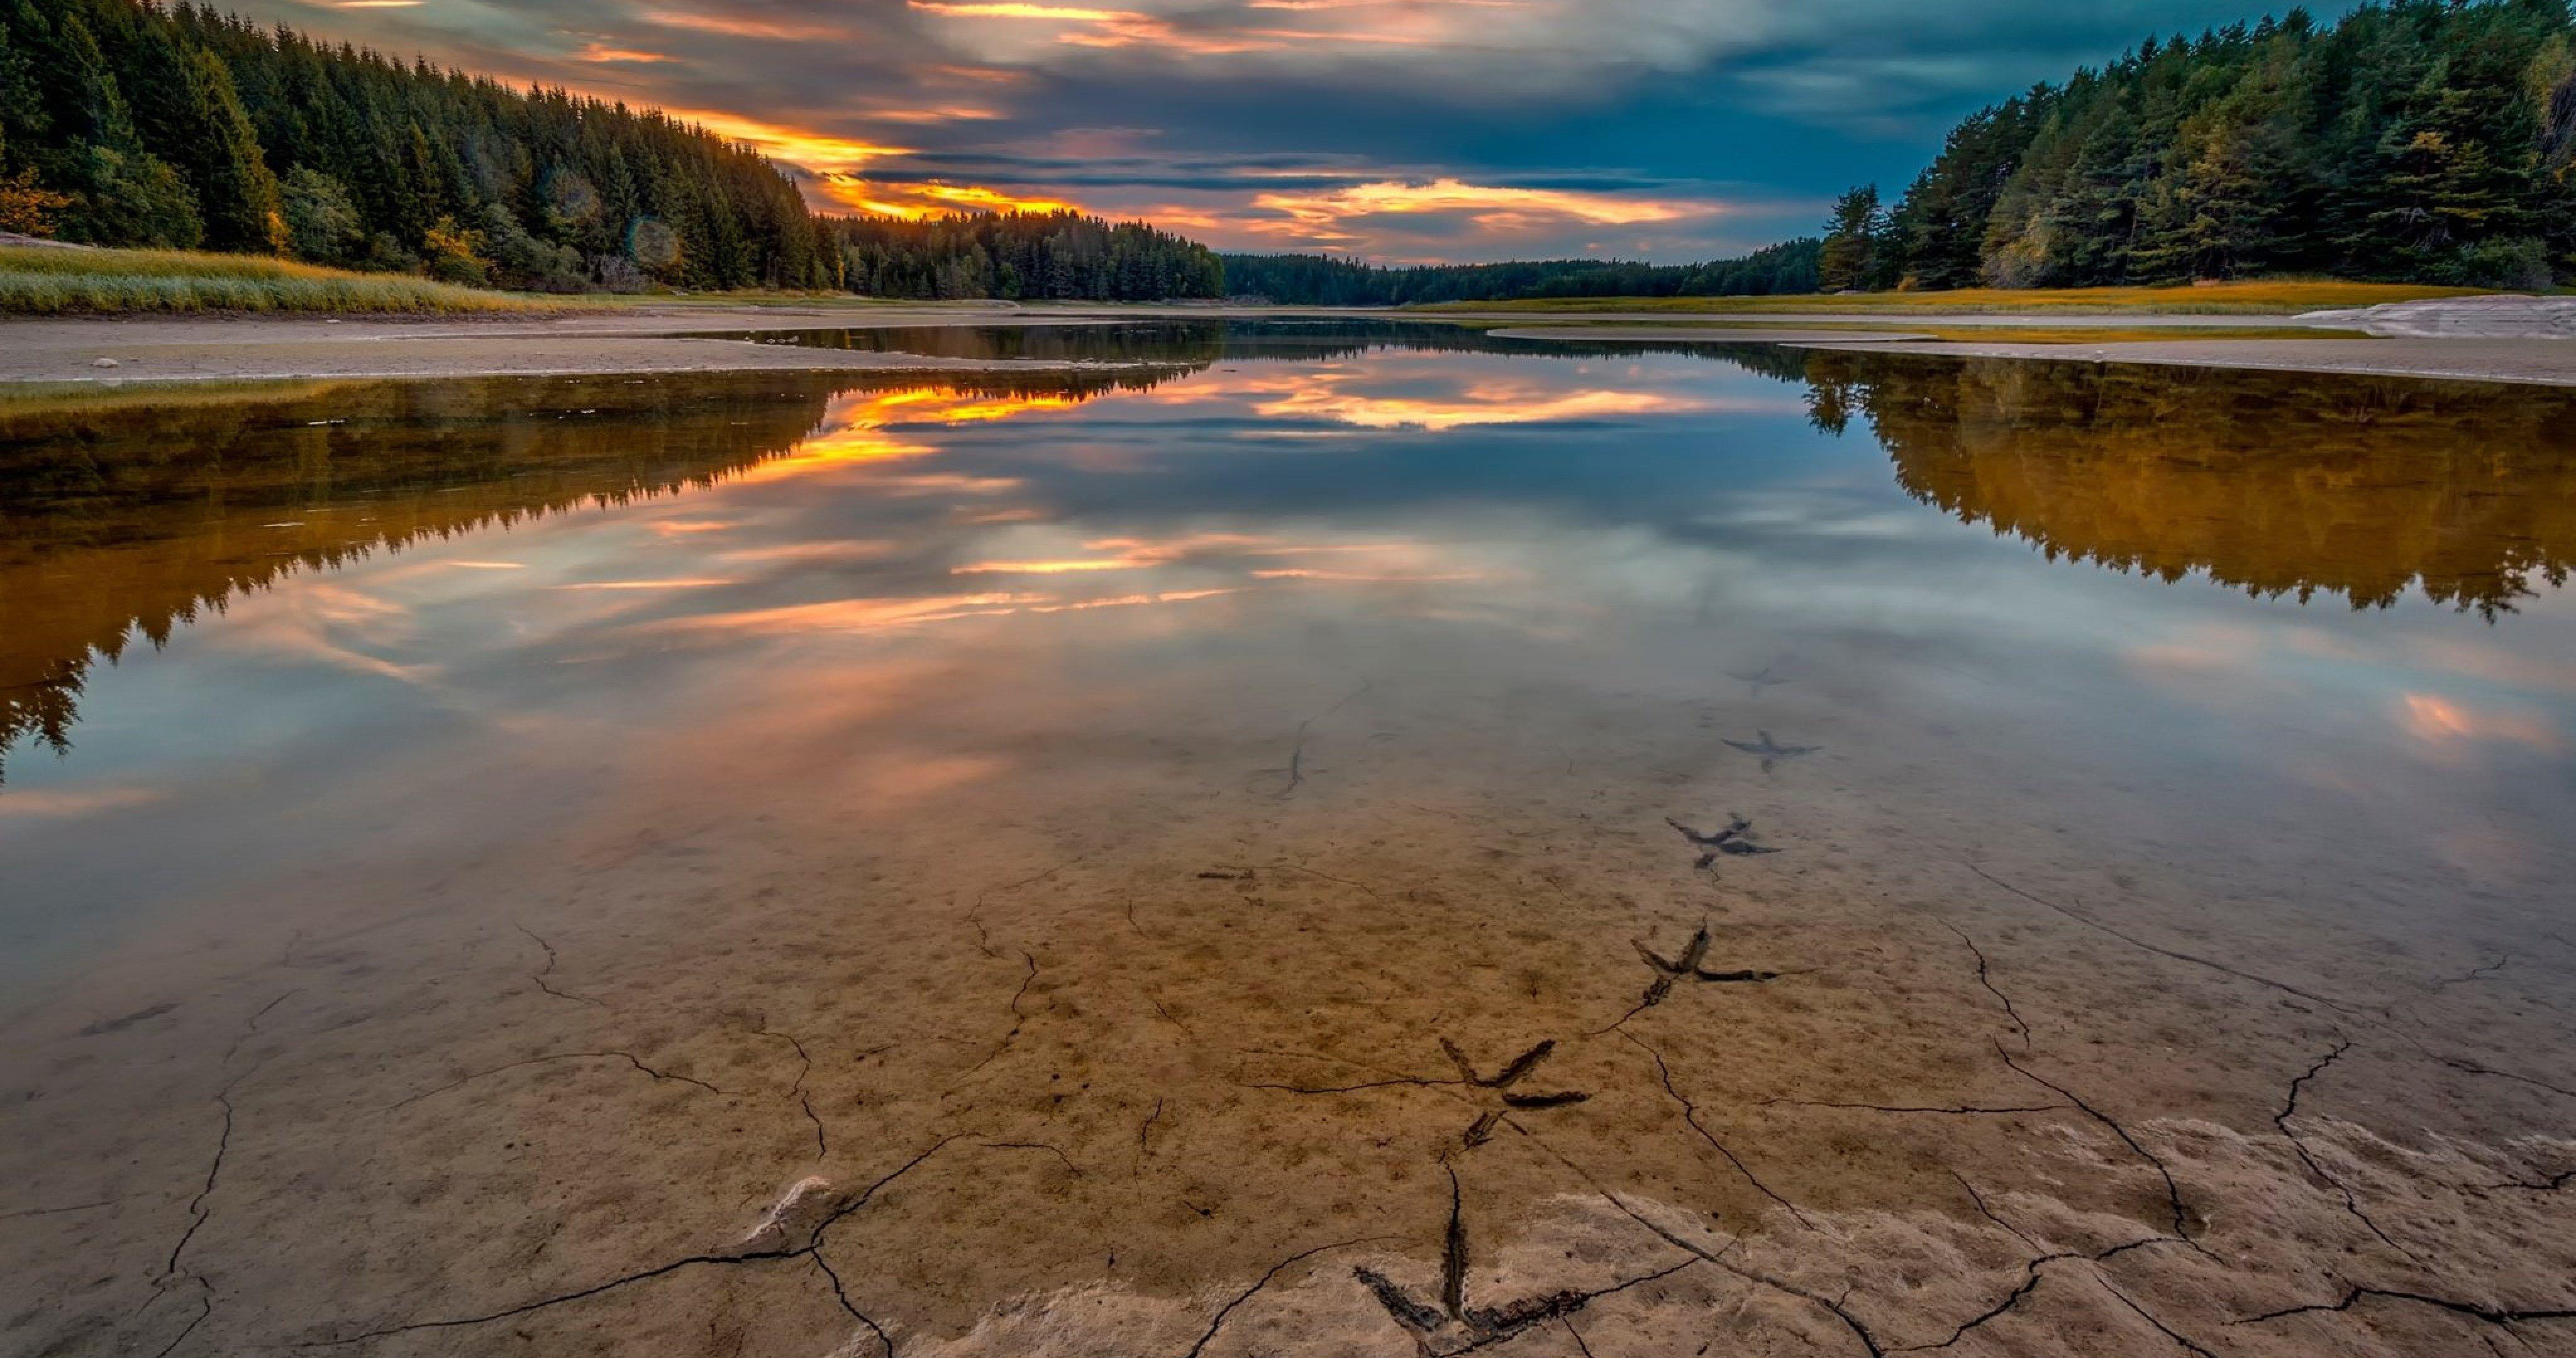 Full Hd Wallpapers Sunsets River In Norway 4k Ultra Hd Wallpaper Ololoshenka Tree